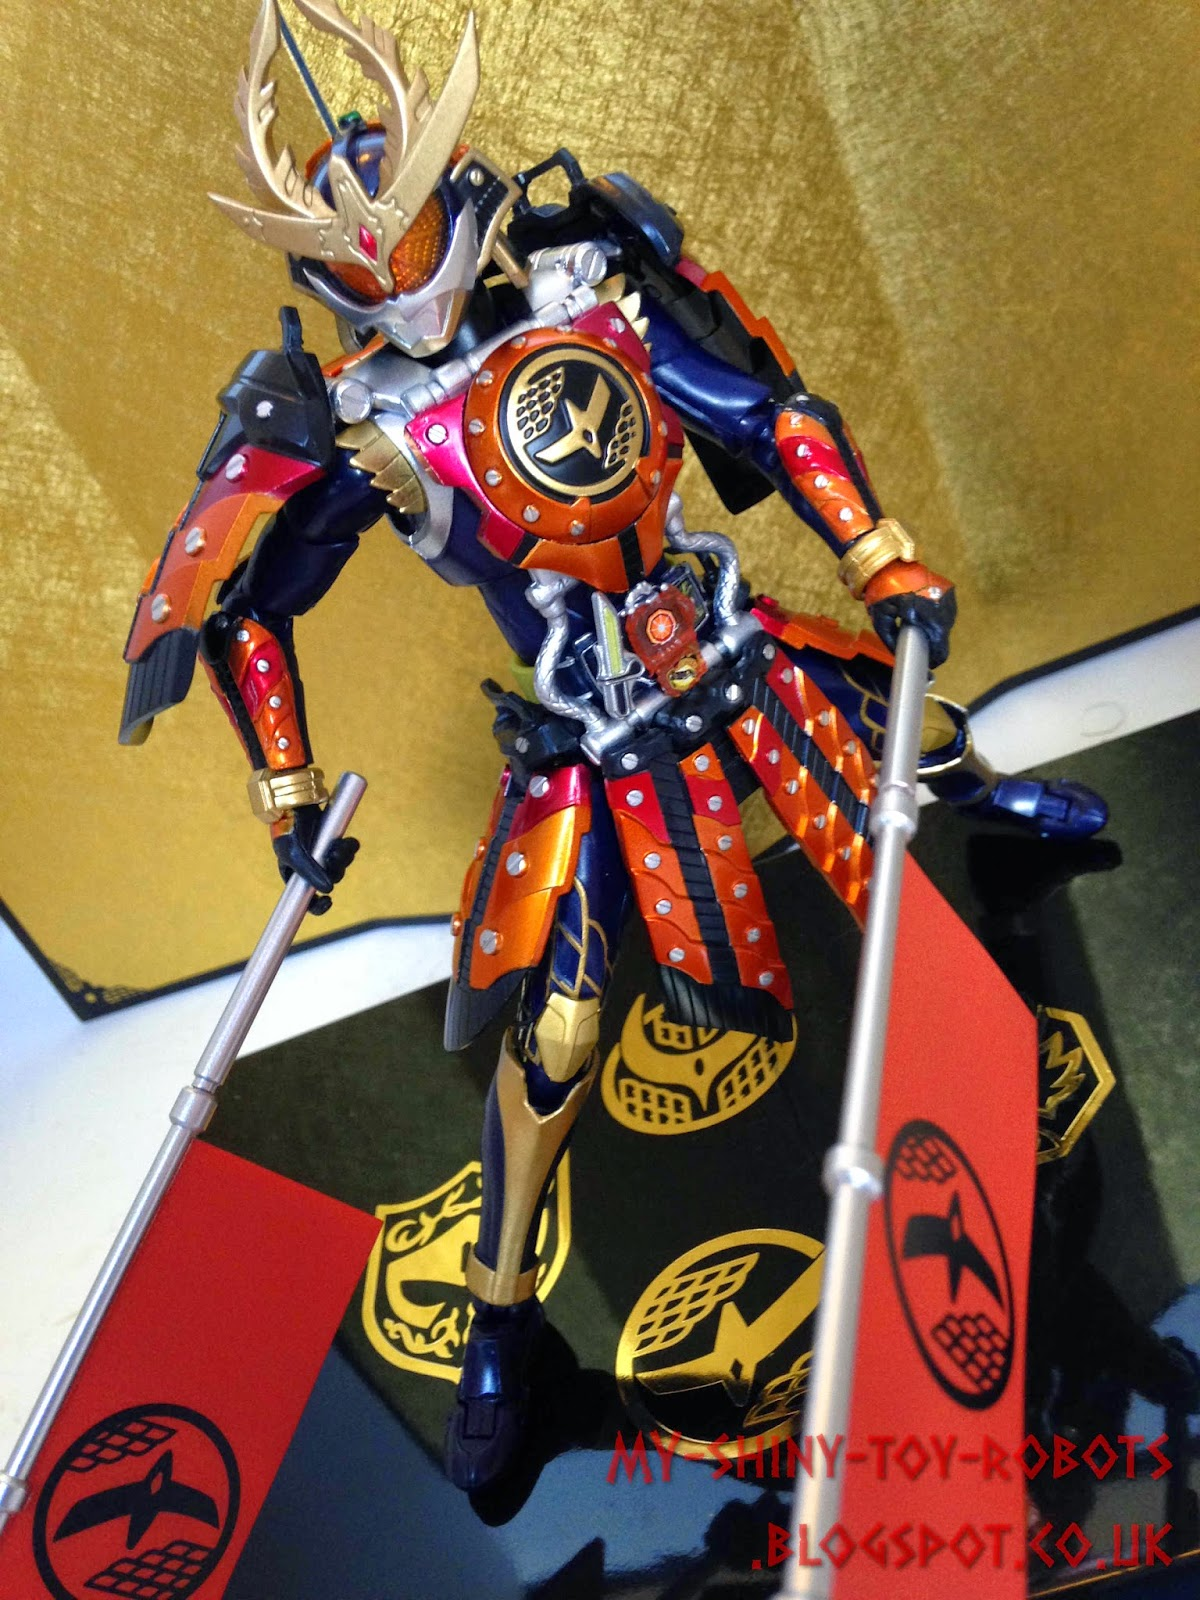 Striking with the Kachidoki Bata